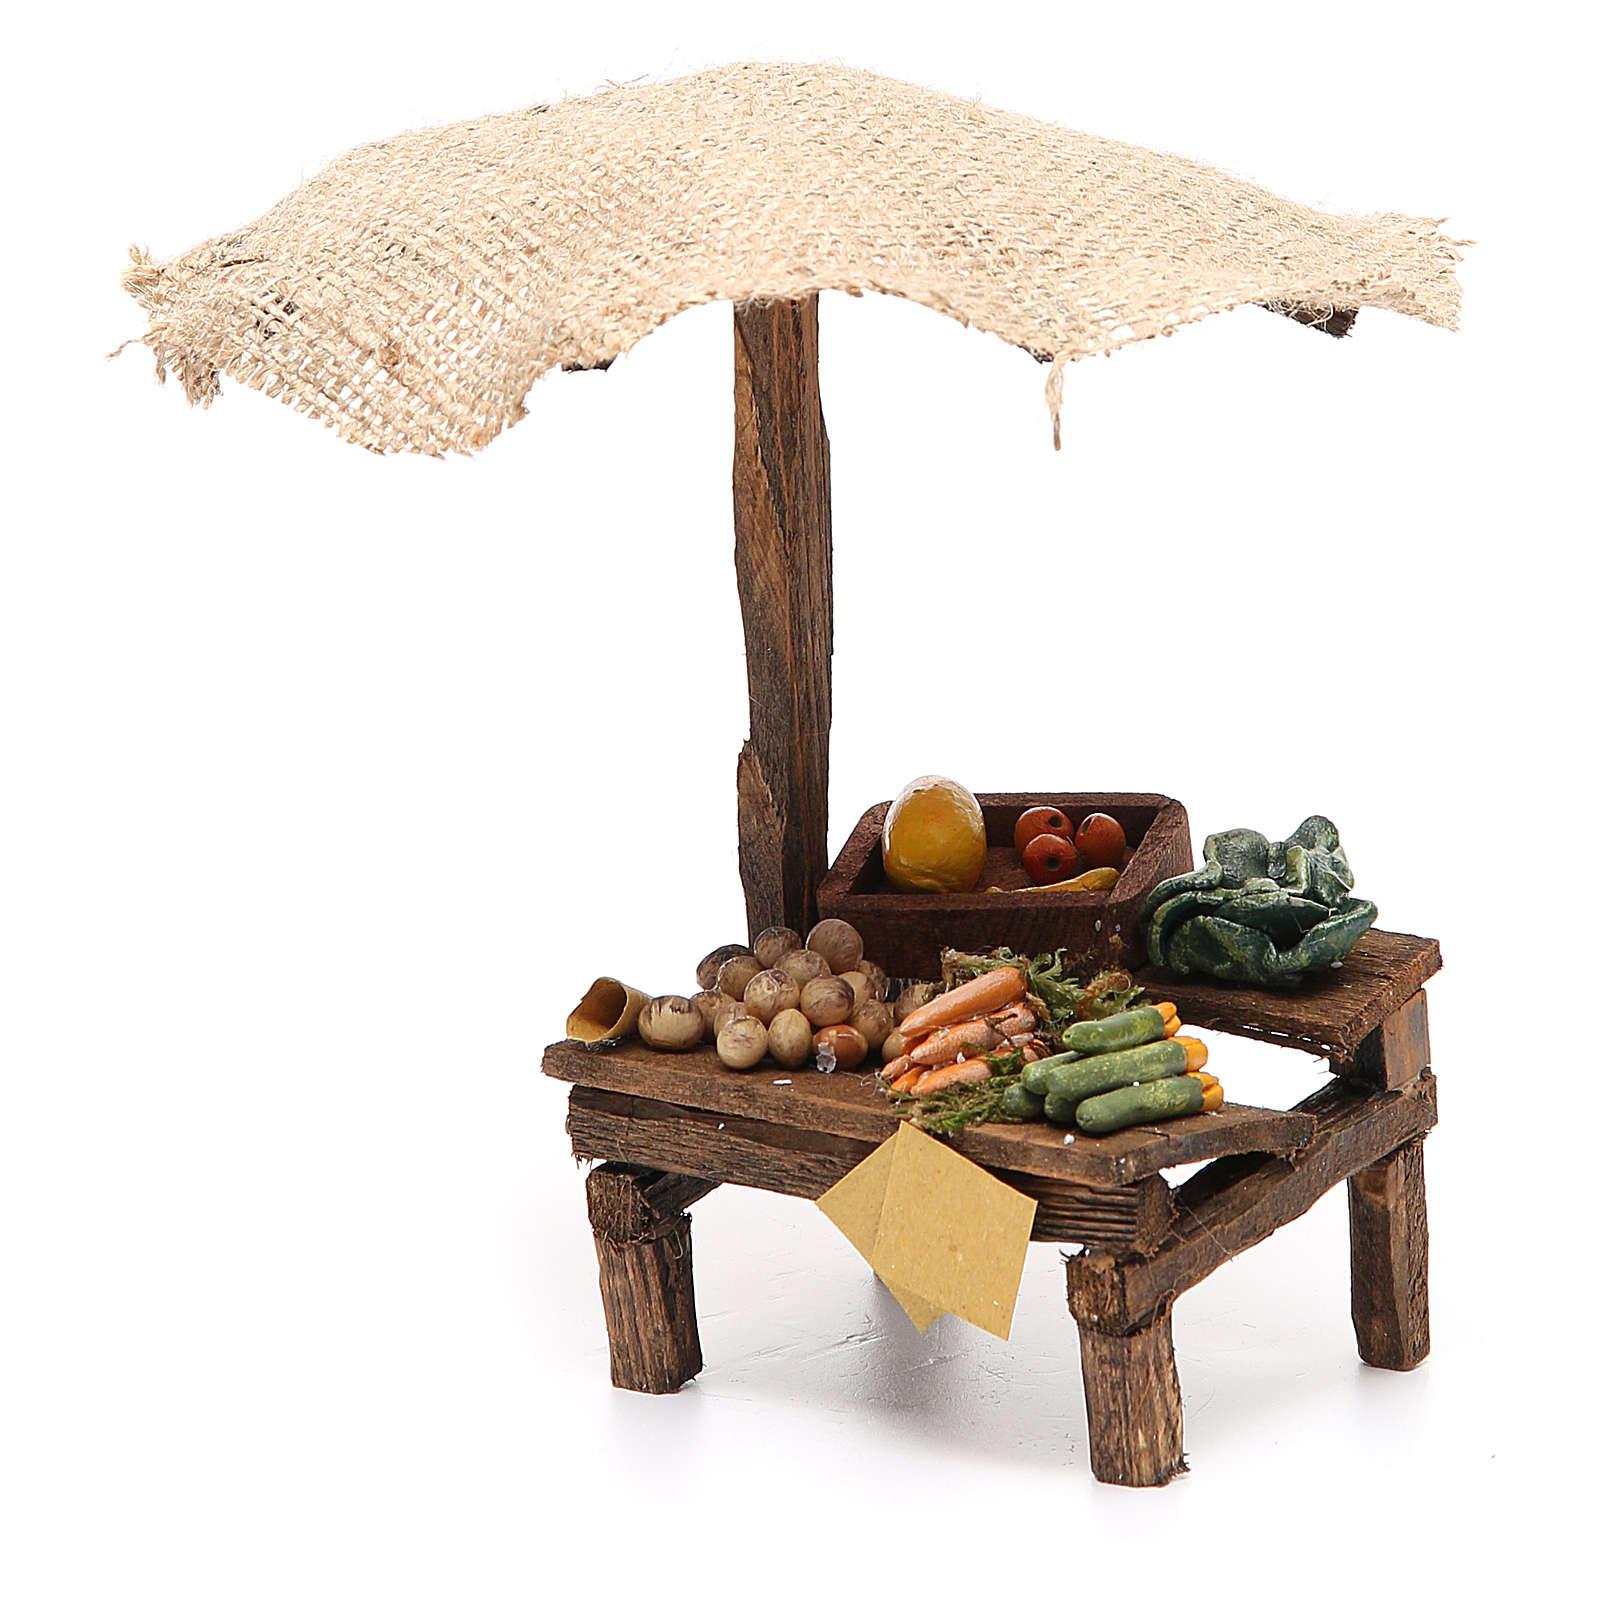 Banchetto presepe con ombrello verdure 16x10x12 cm 4